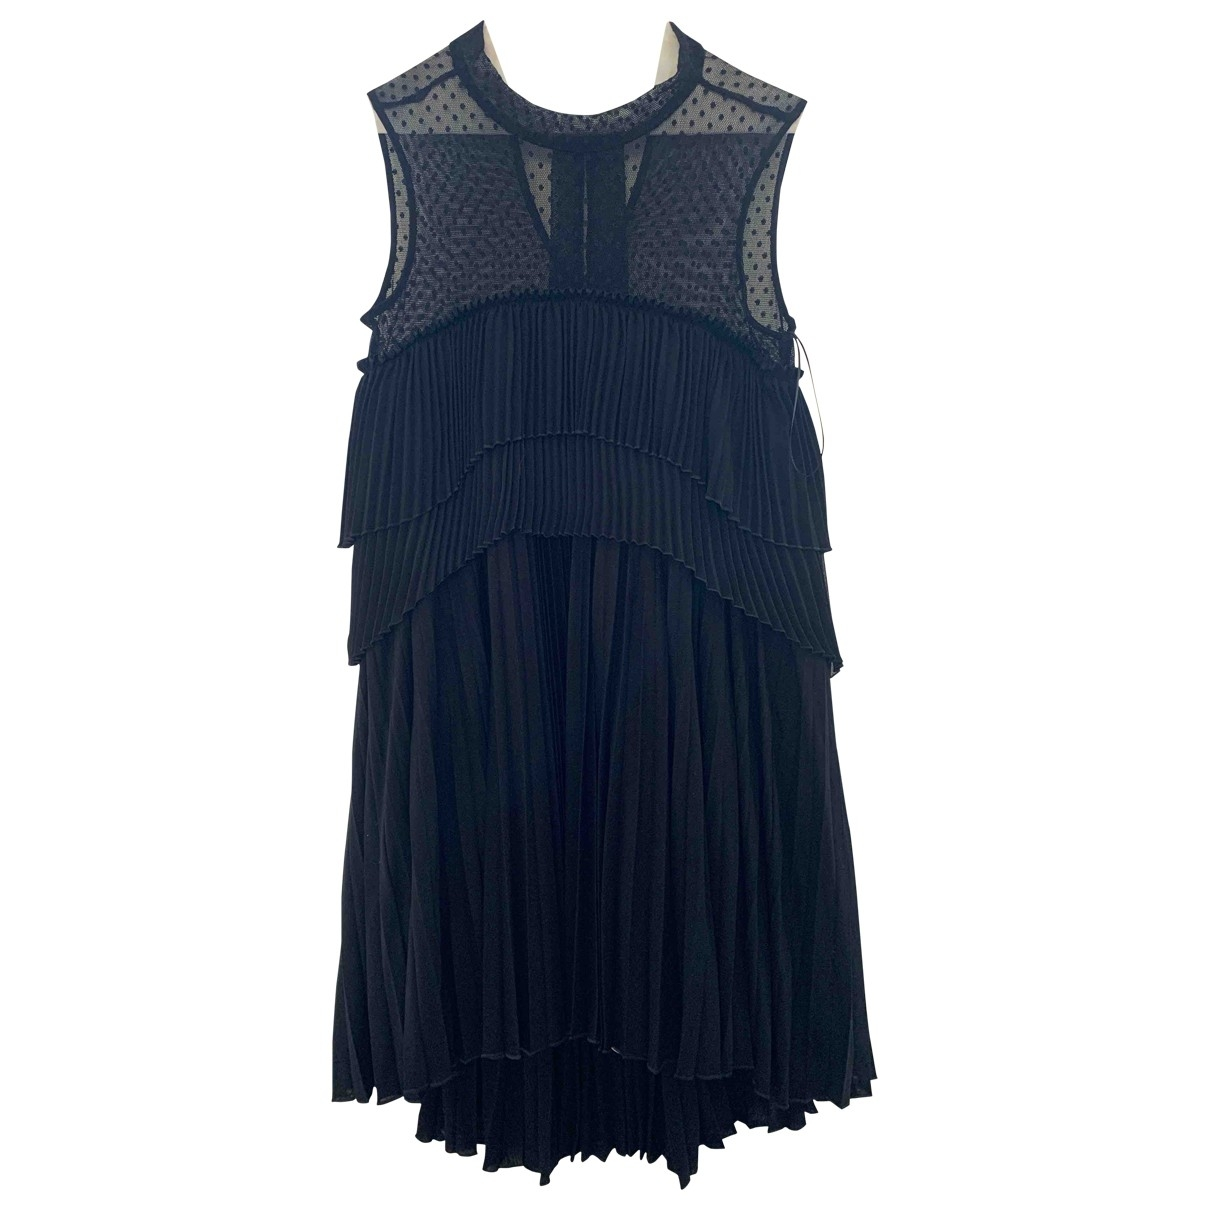 Max Mara \N Black Cotton - elasthane dress for Women 40 IT